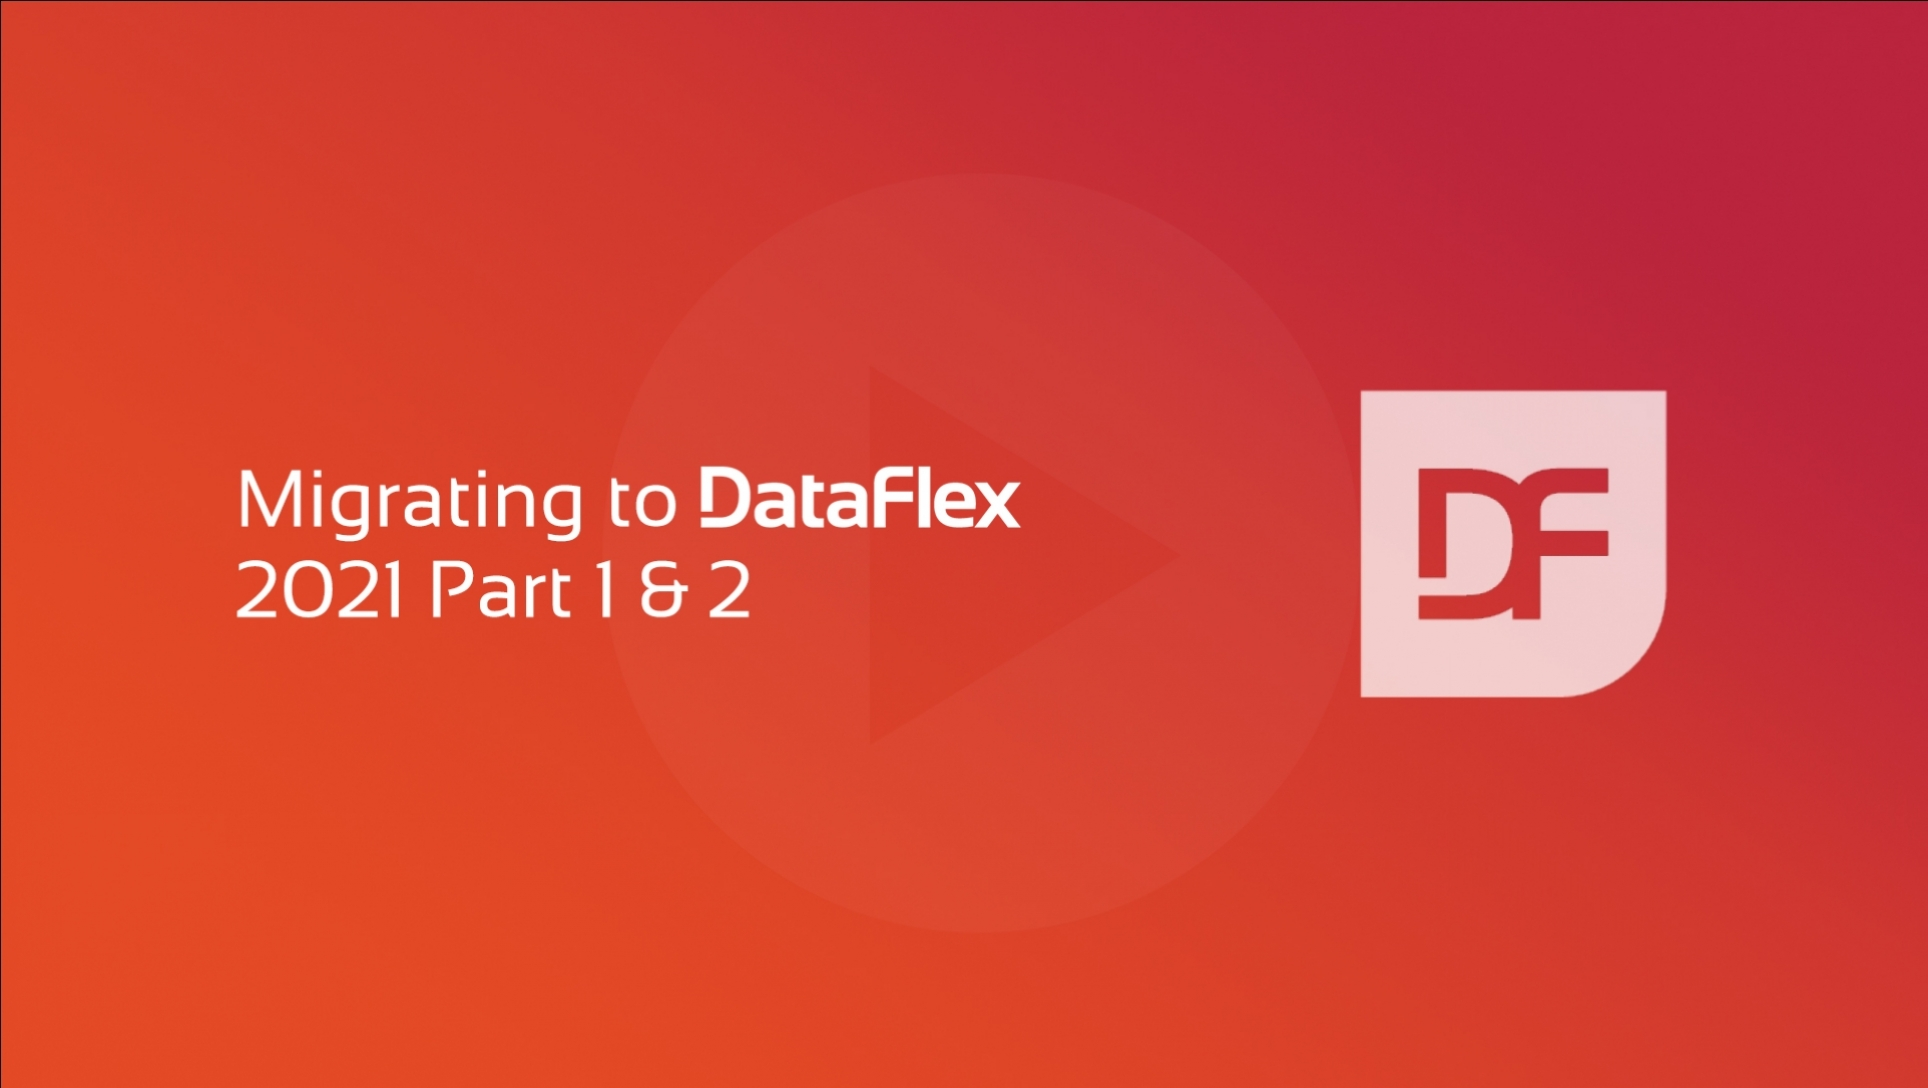 Migrating to DataFlex 2021 Part 2 - Unicode